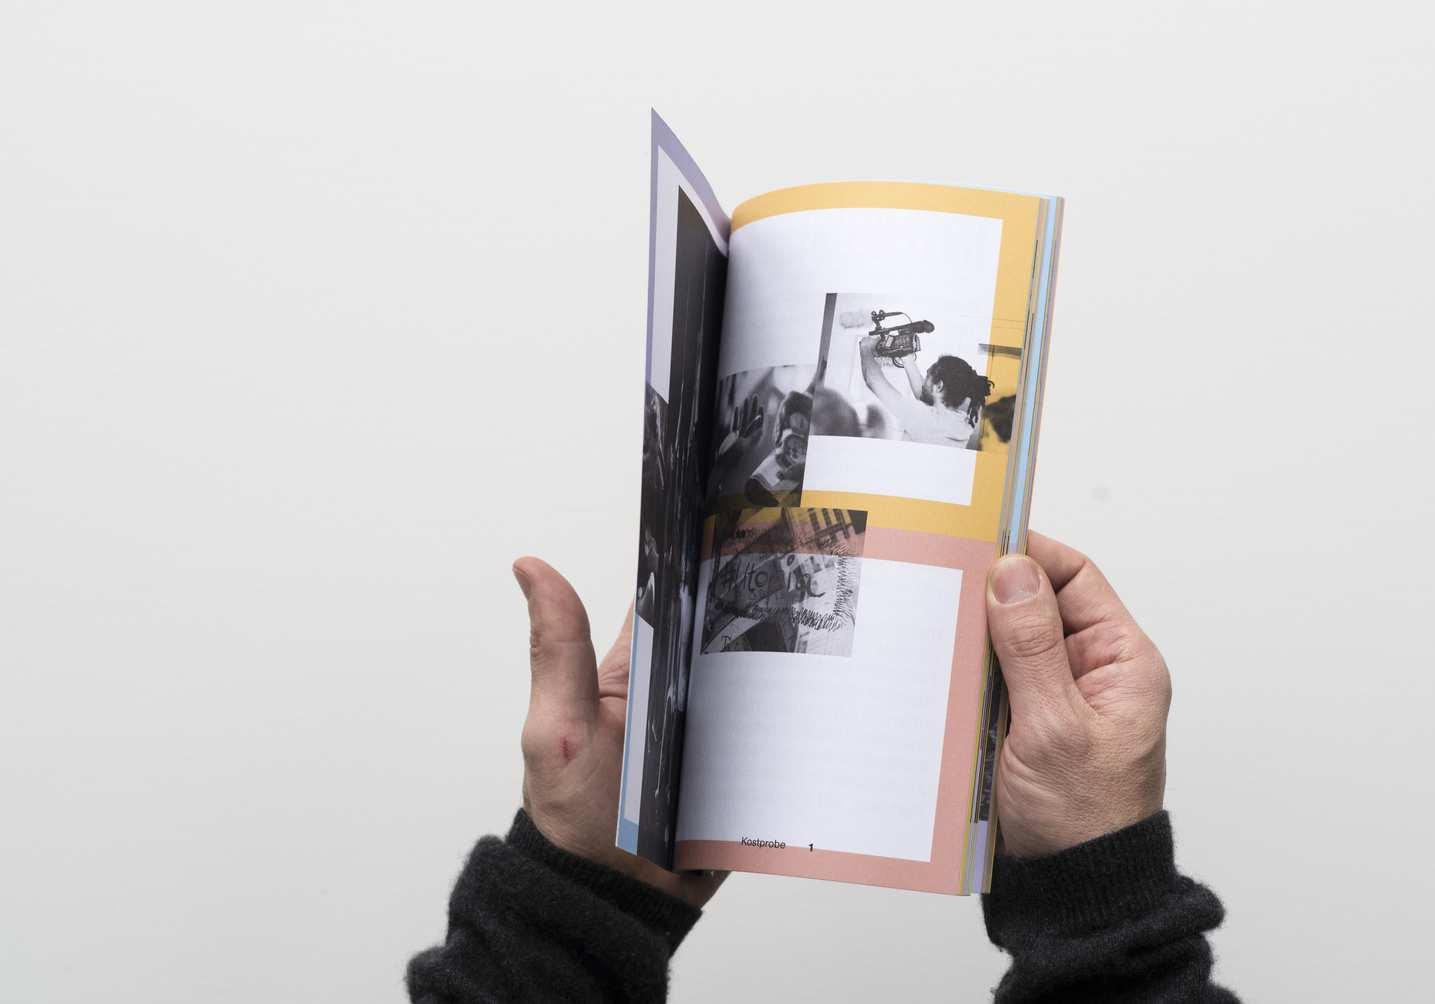 kost-brochure-1-1435x1004px